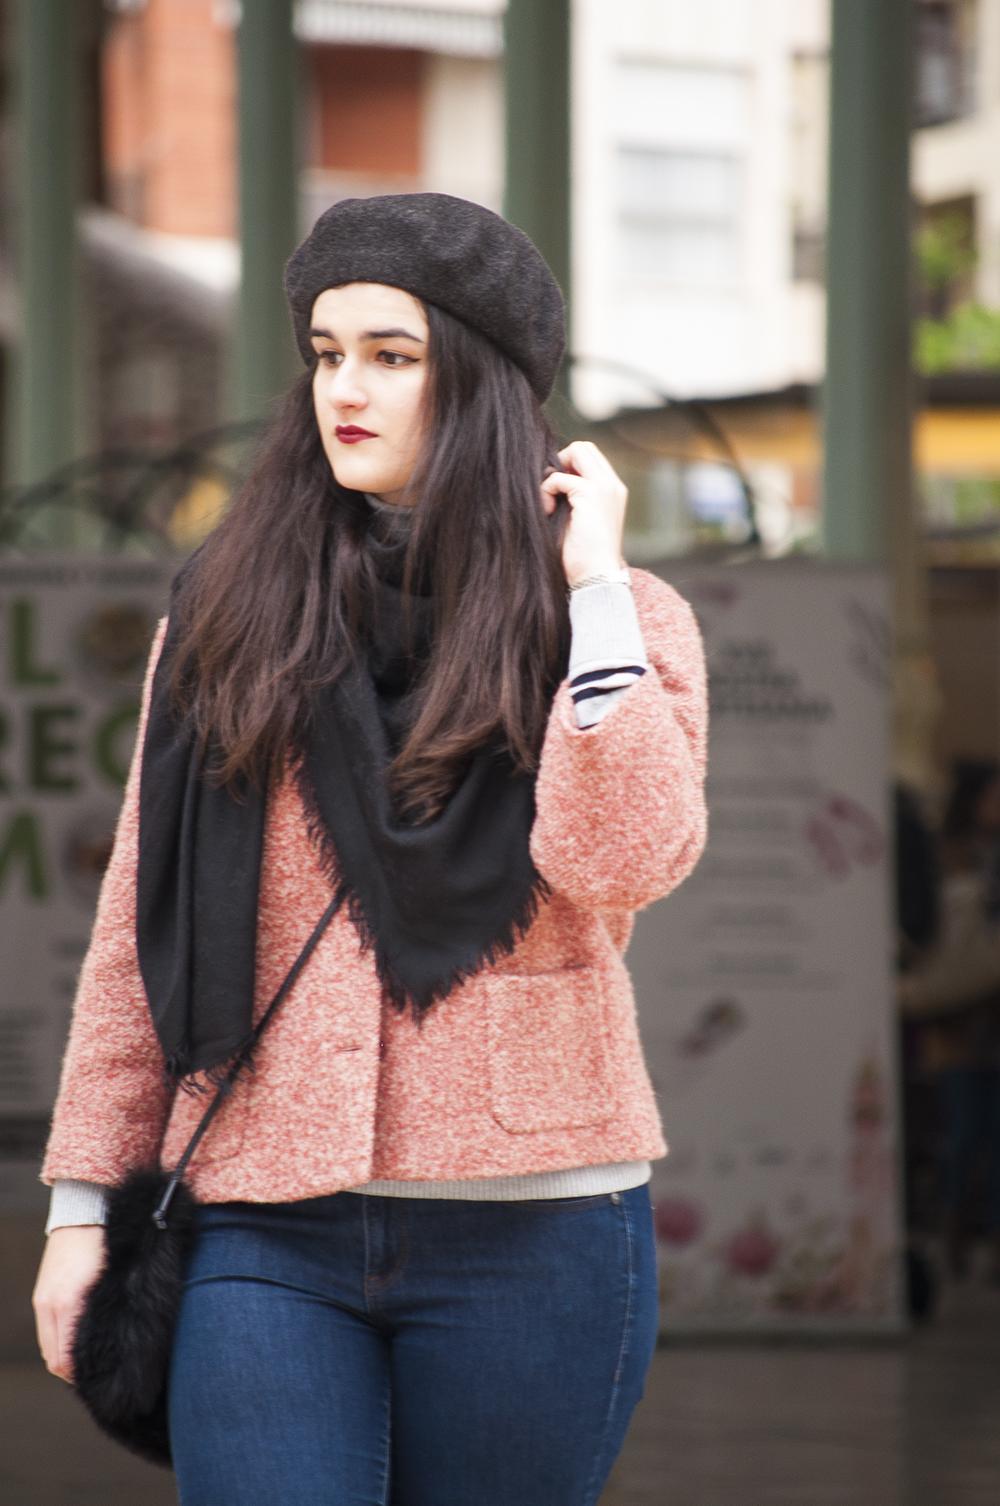 valencia fashion blogger spain somethingfashion outfit winter dailyDSC_0567